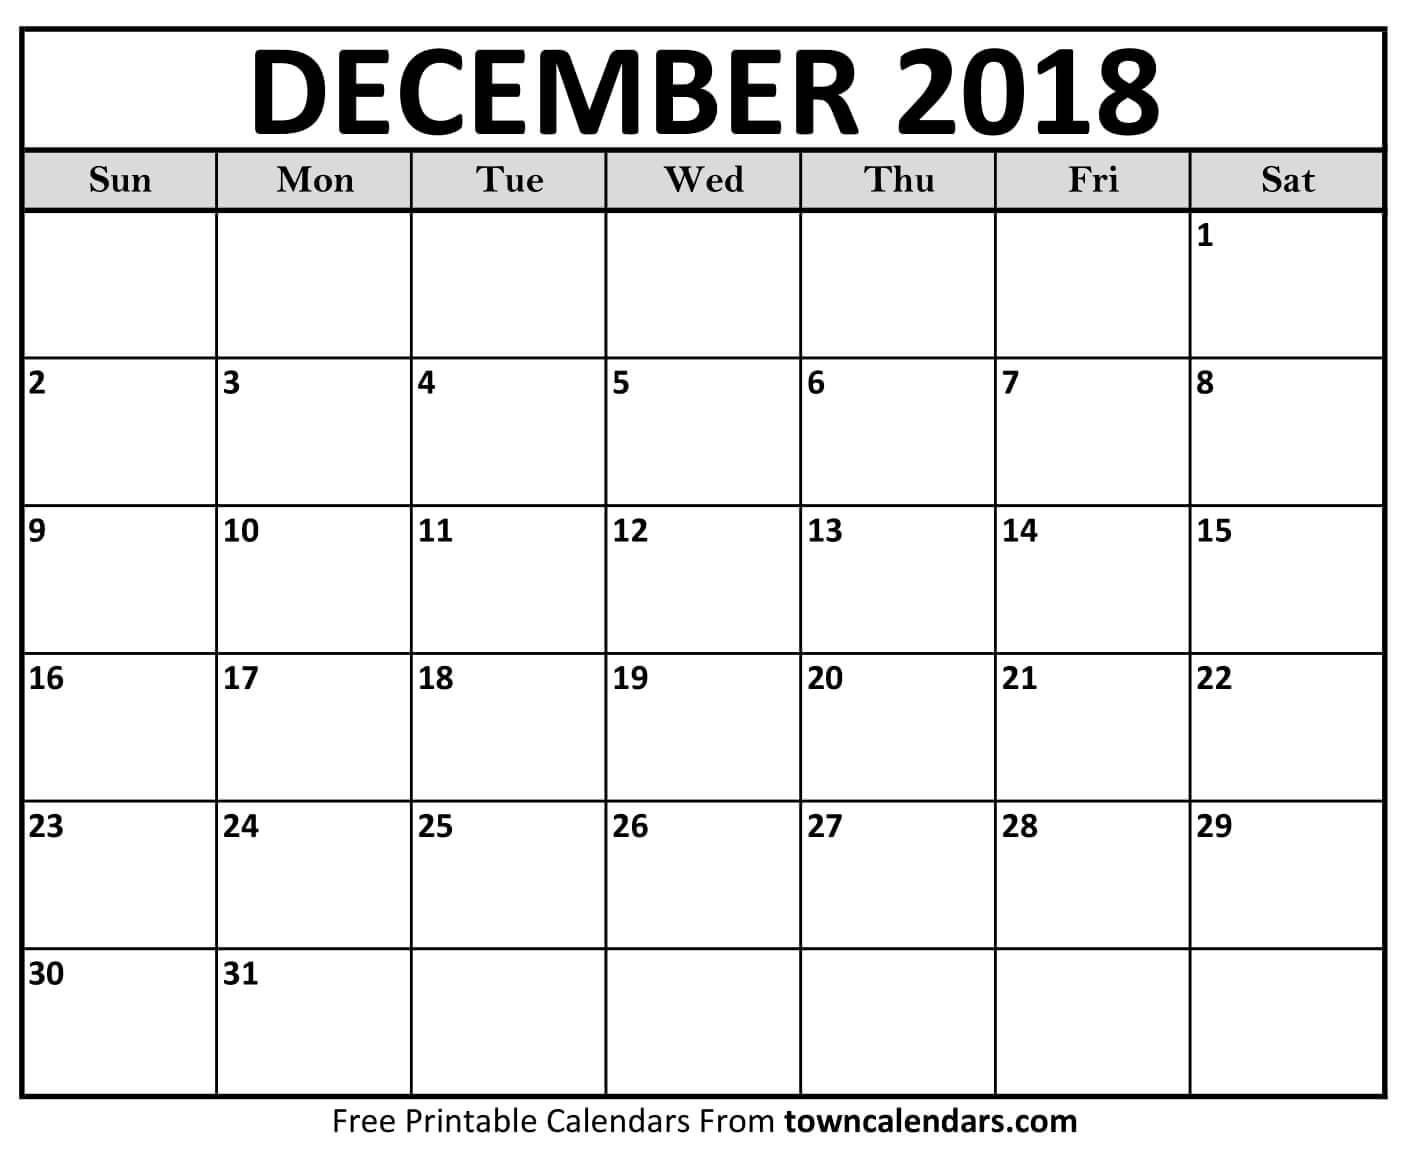 Printable 2018 December Calendar Template - Printable Calendar 2019 with Dec Calendar Printable Template